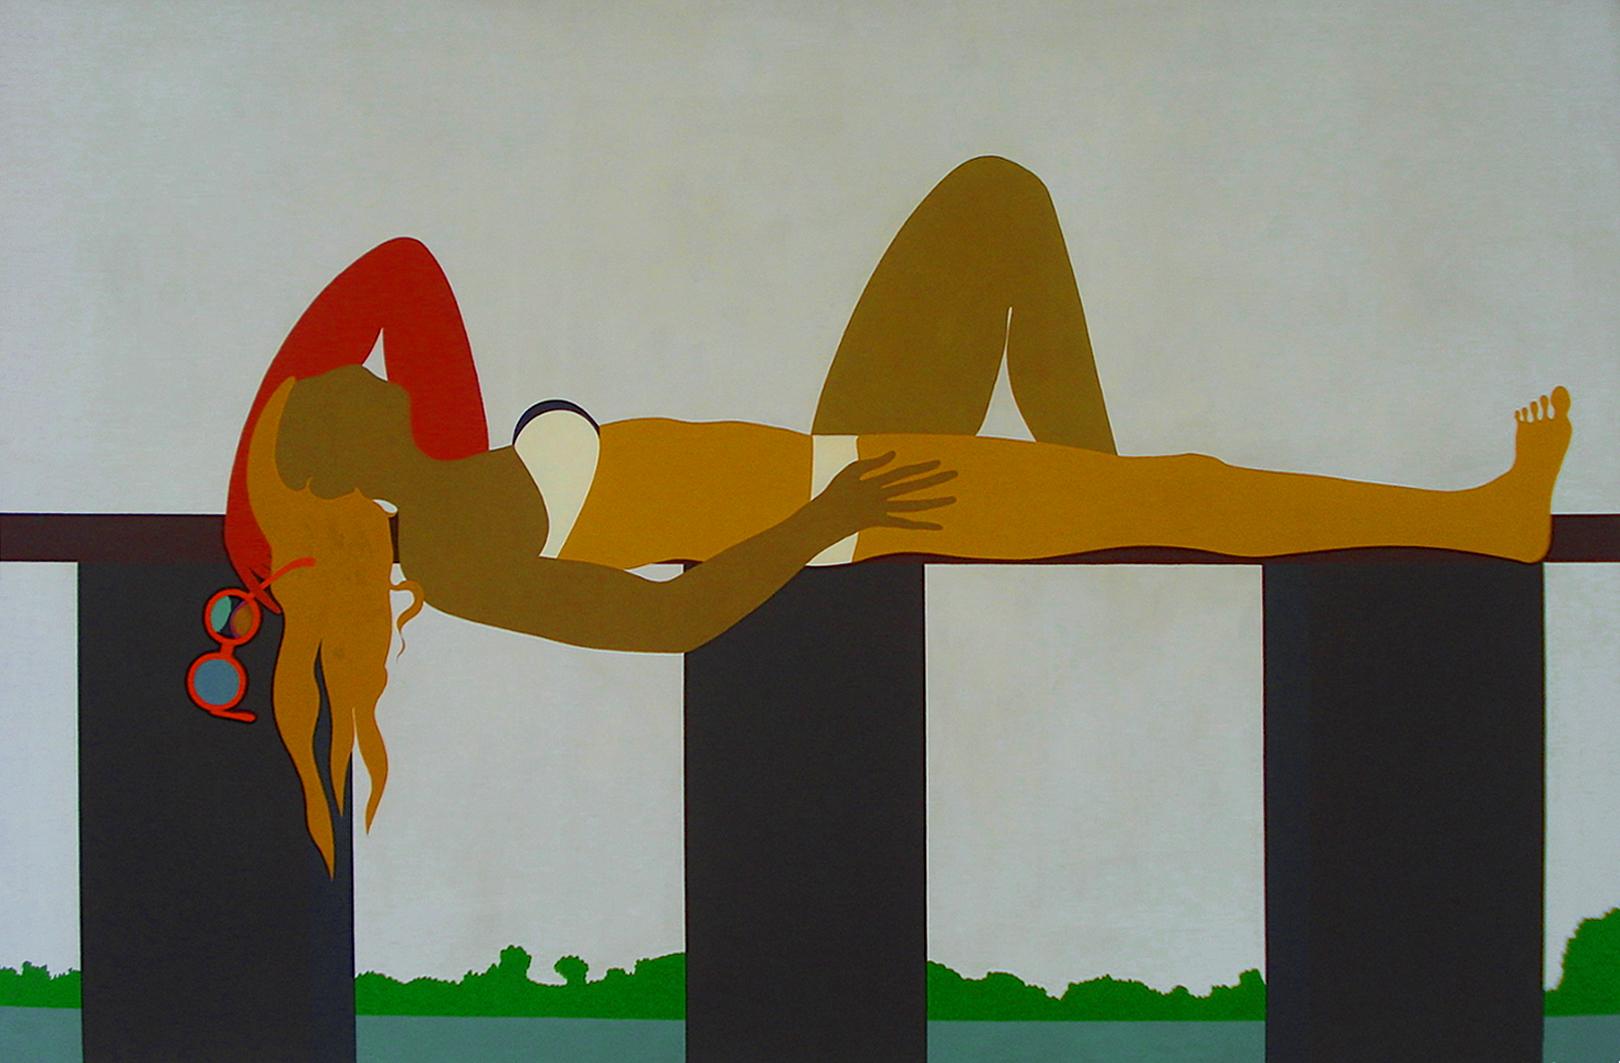 Емануель Проуллер. На березі озера, 1973; олія, полотно